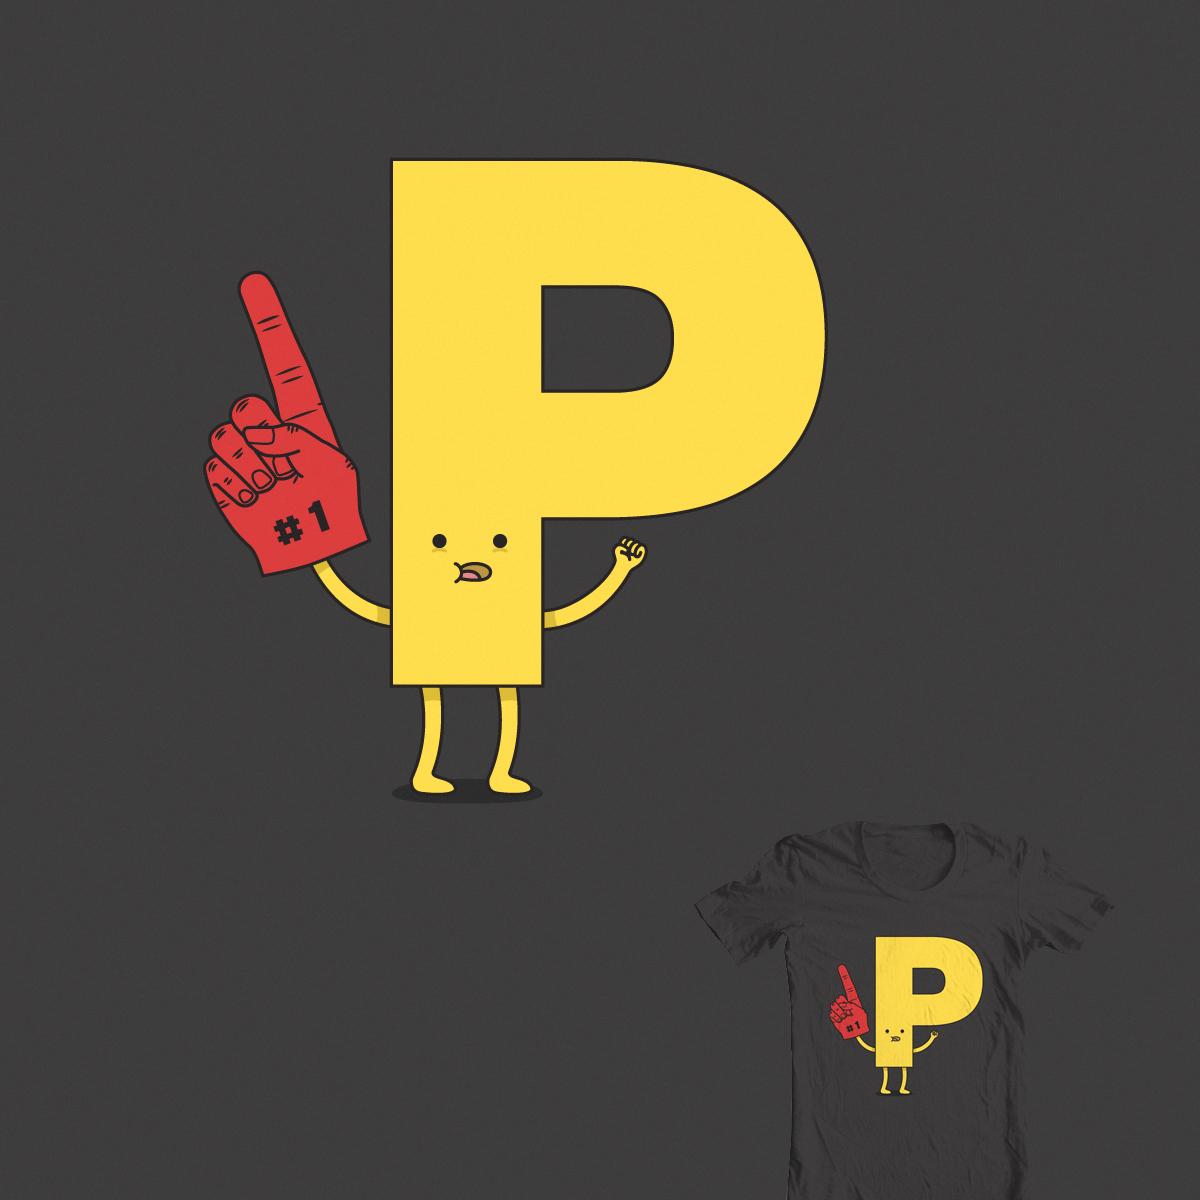 Go Pee! by Haasbroek on Threadless